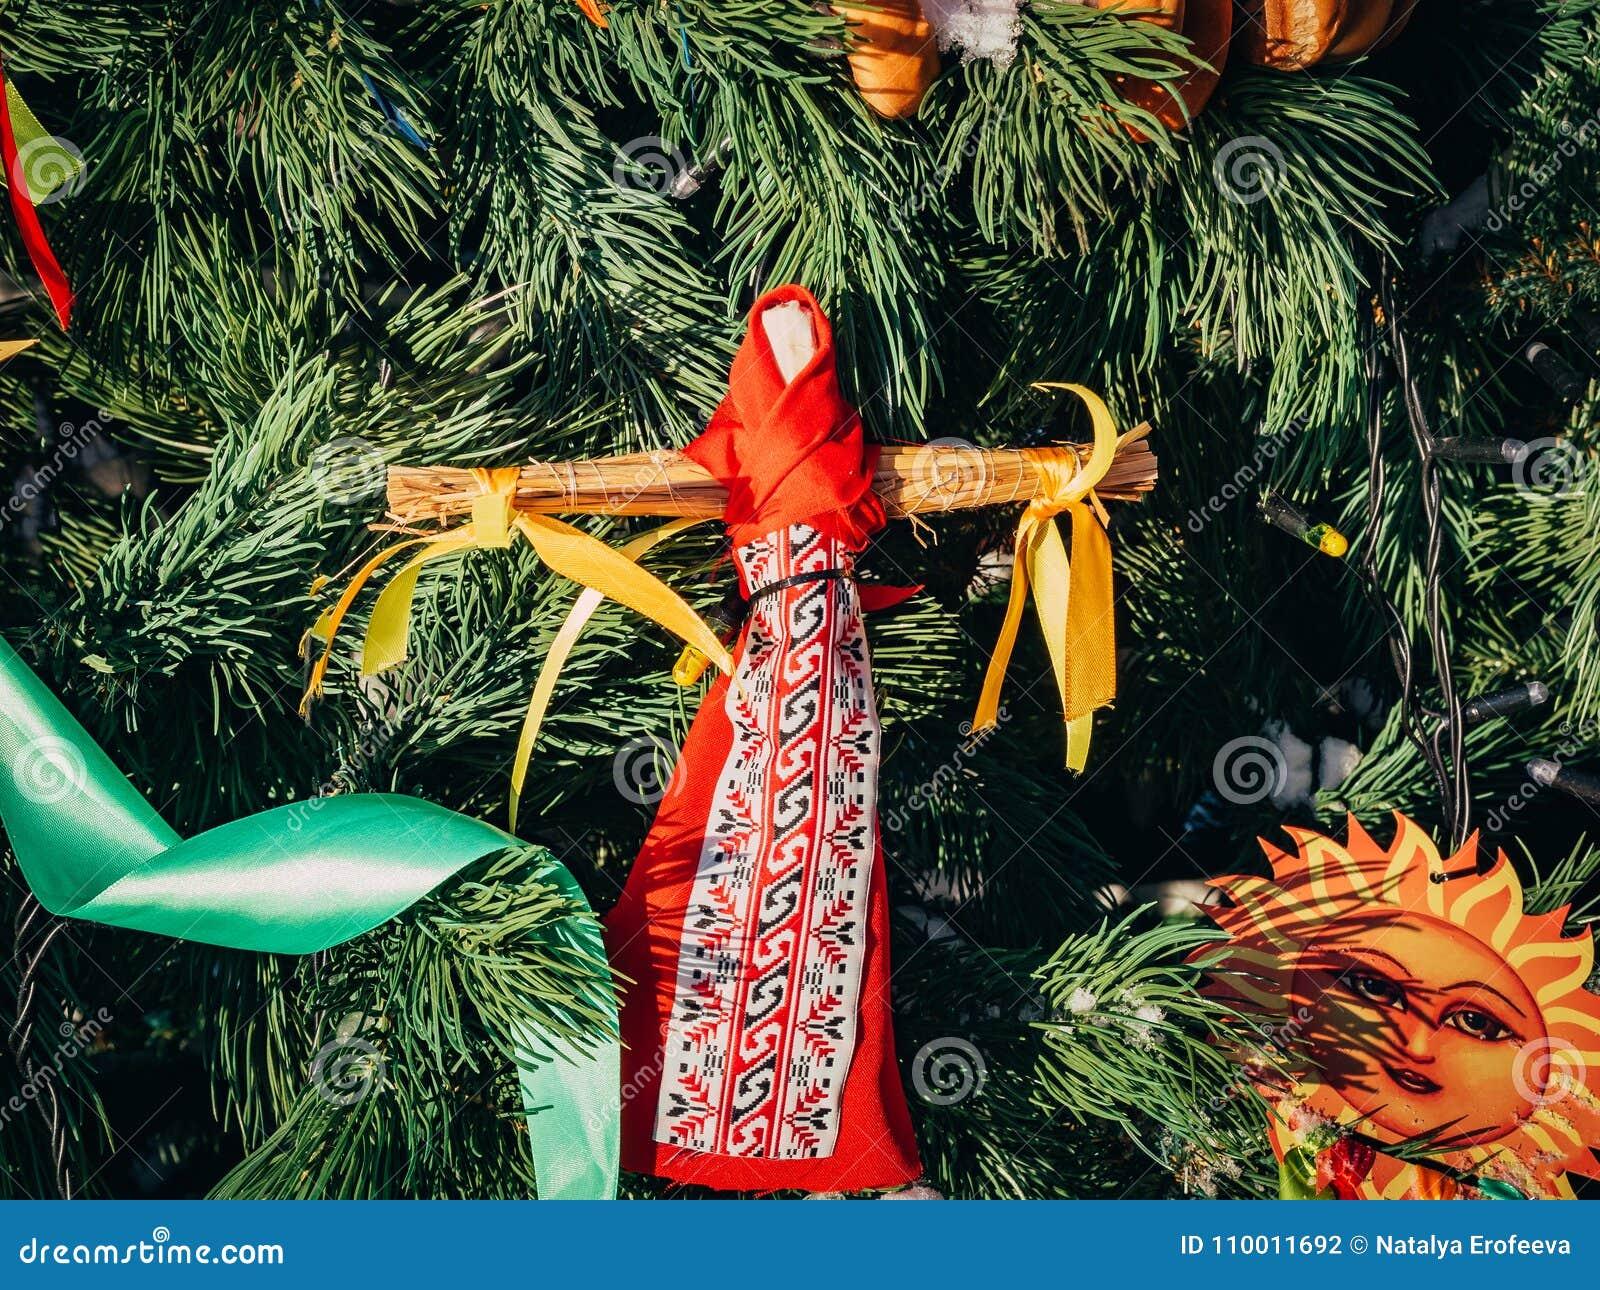 rag dolls on christmas tree on folk slavic pagan holiday maslenitsa of the end of winter